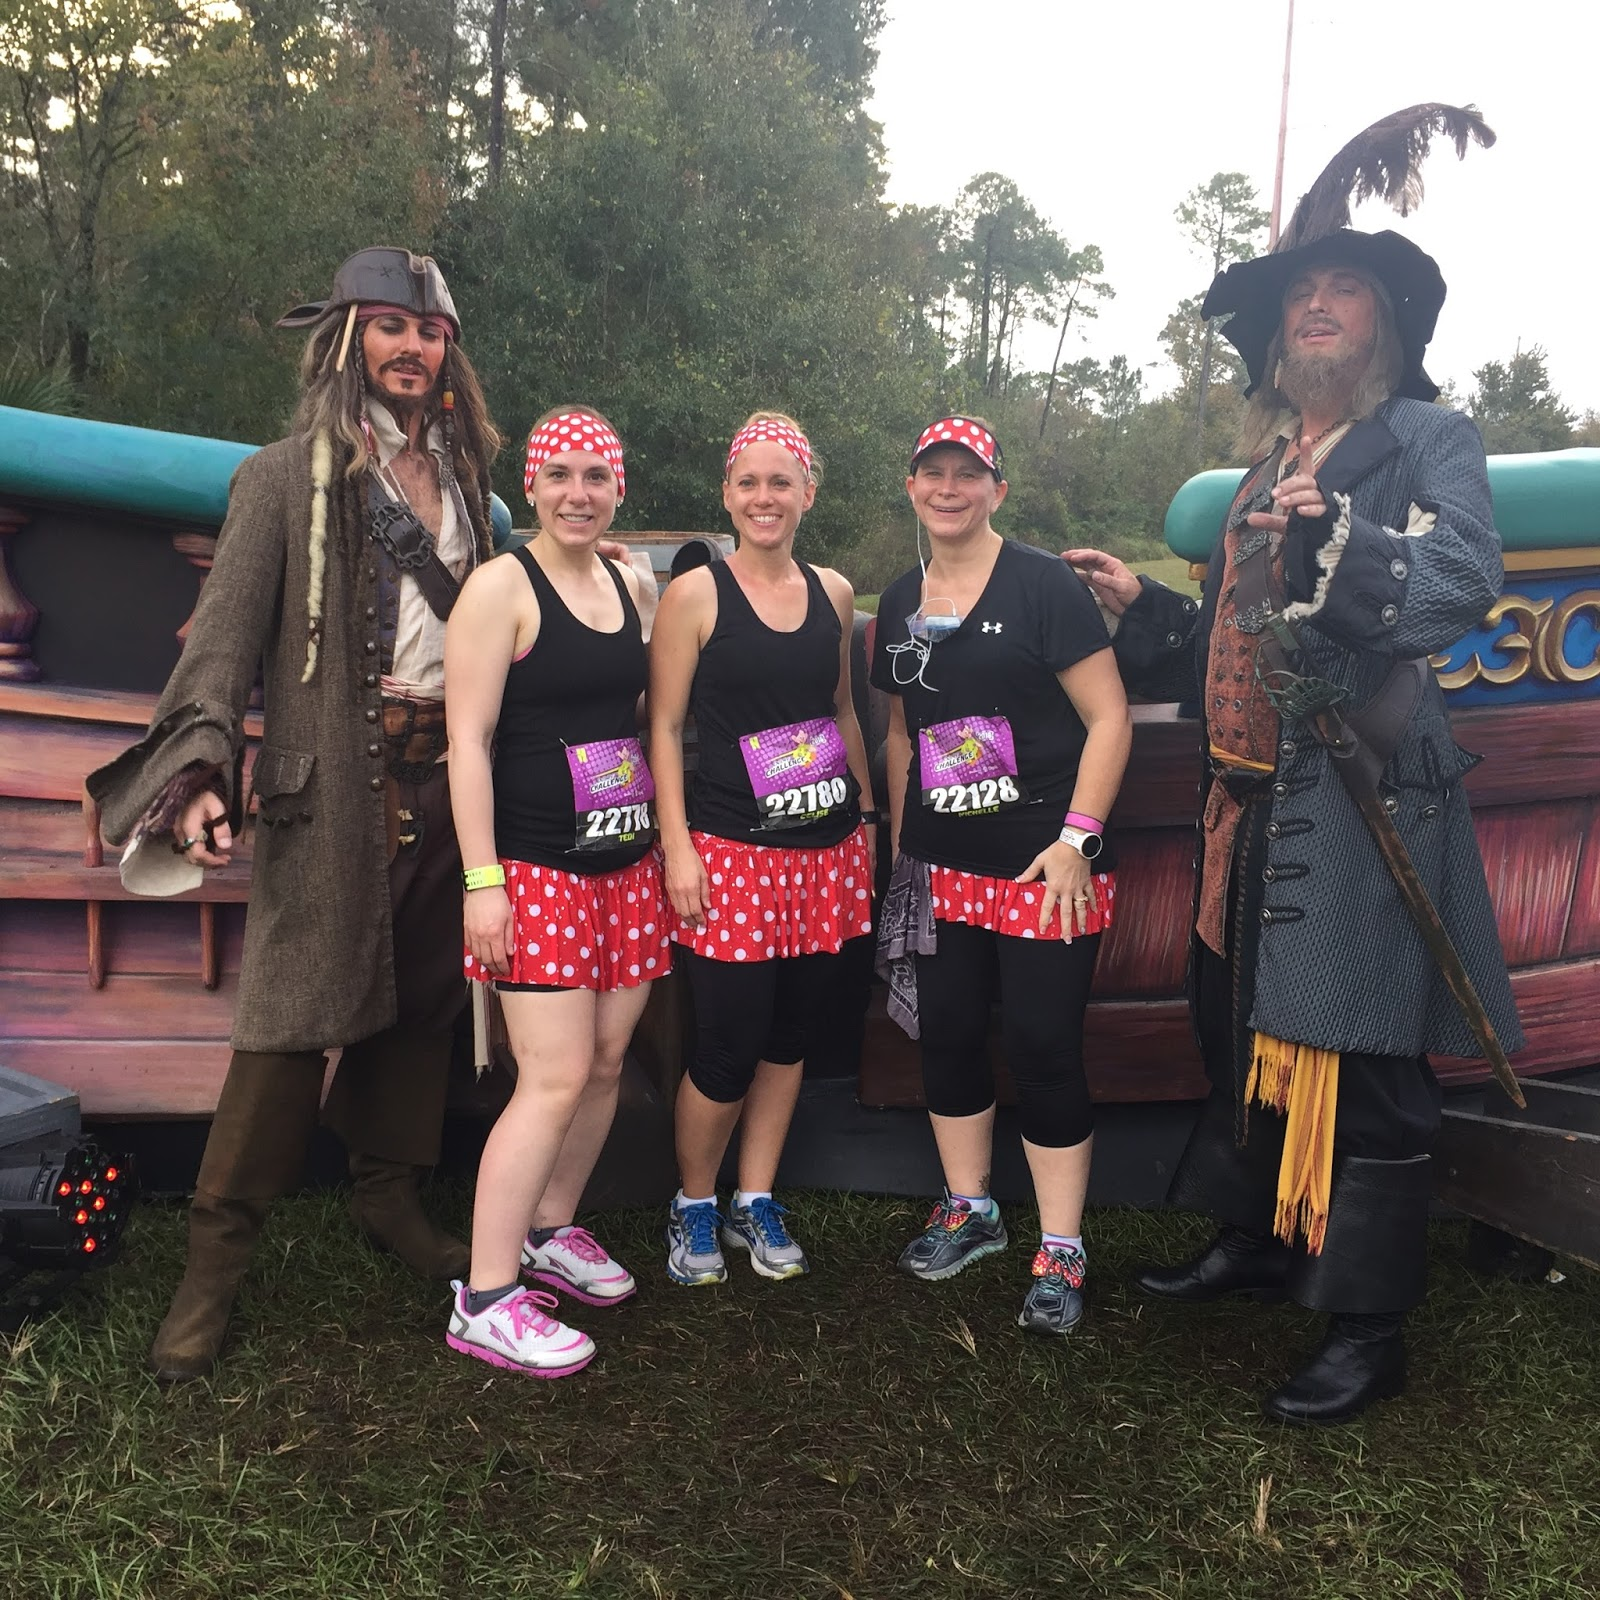 Dopey Challenge Mickey Marathon 2016 Jack Sparrow and Captain Barbosa